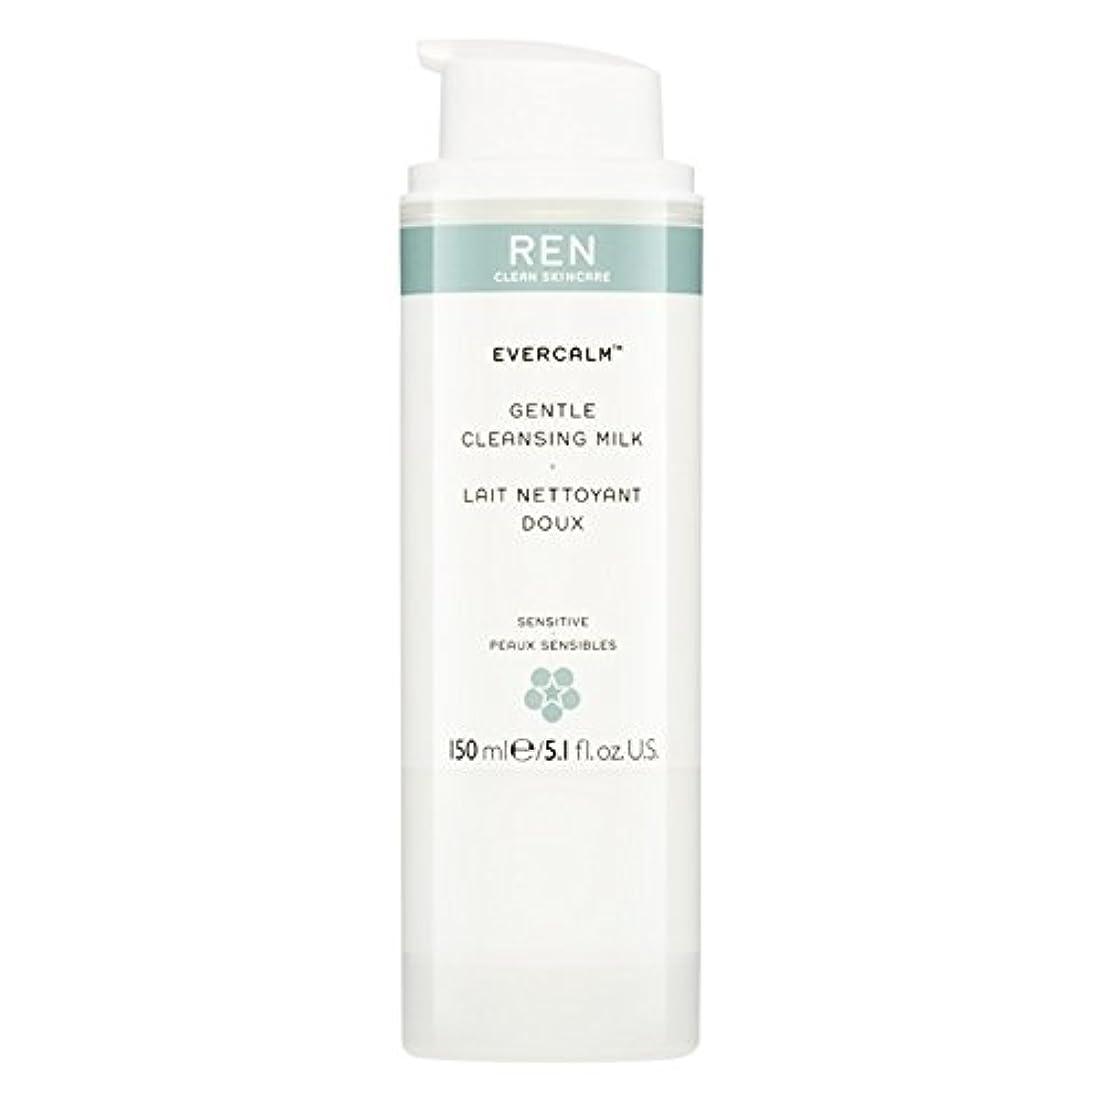 Ren Evercalm優しいクレンジングミルク、150ミリリットル (REN) (x2) - REN Evercalm Gentle Cleansing Milk, 150ml (Pack of 2) [並行輸入品]